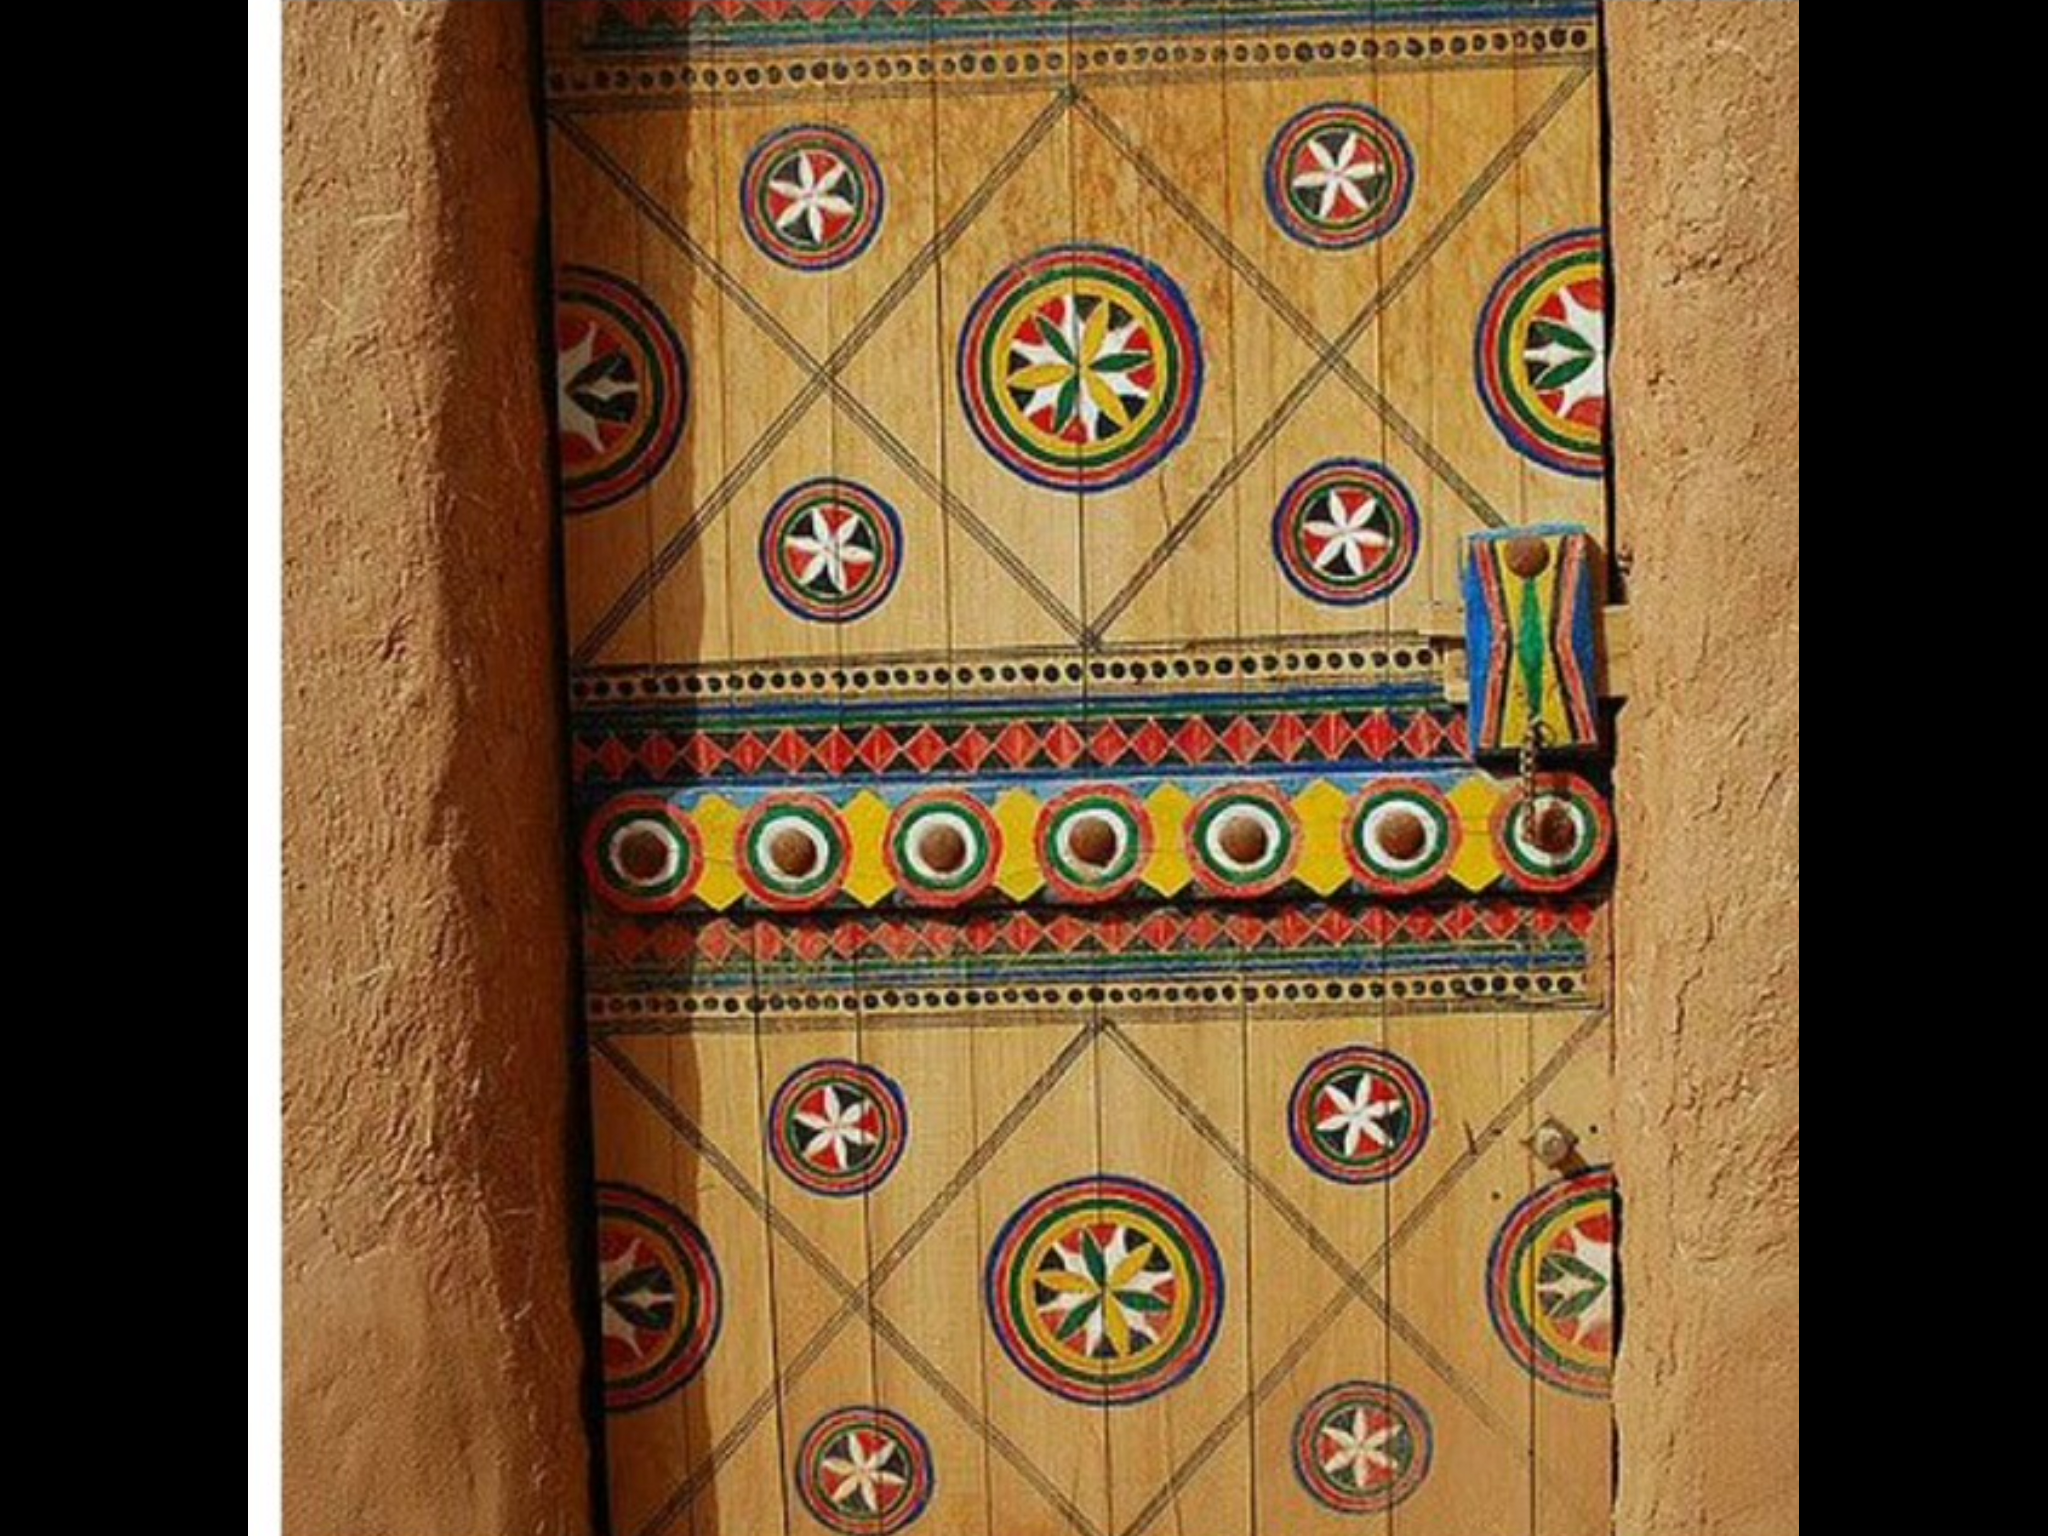 Pin By Aljawhara On مباني ومفروشات تراثية Office Office Supplies Supplies